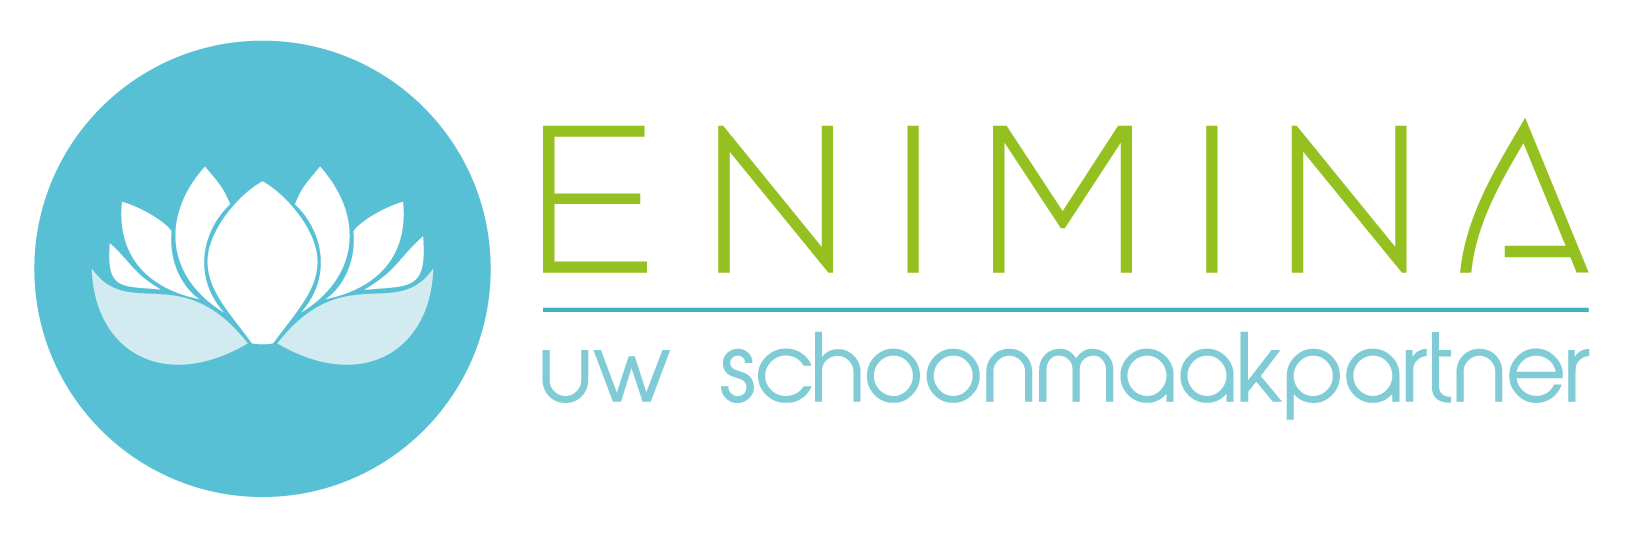 Enimina_Web